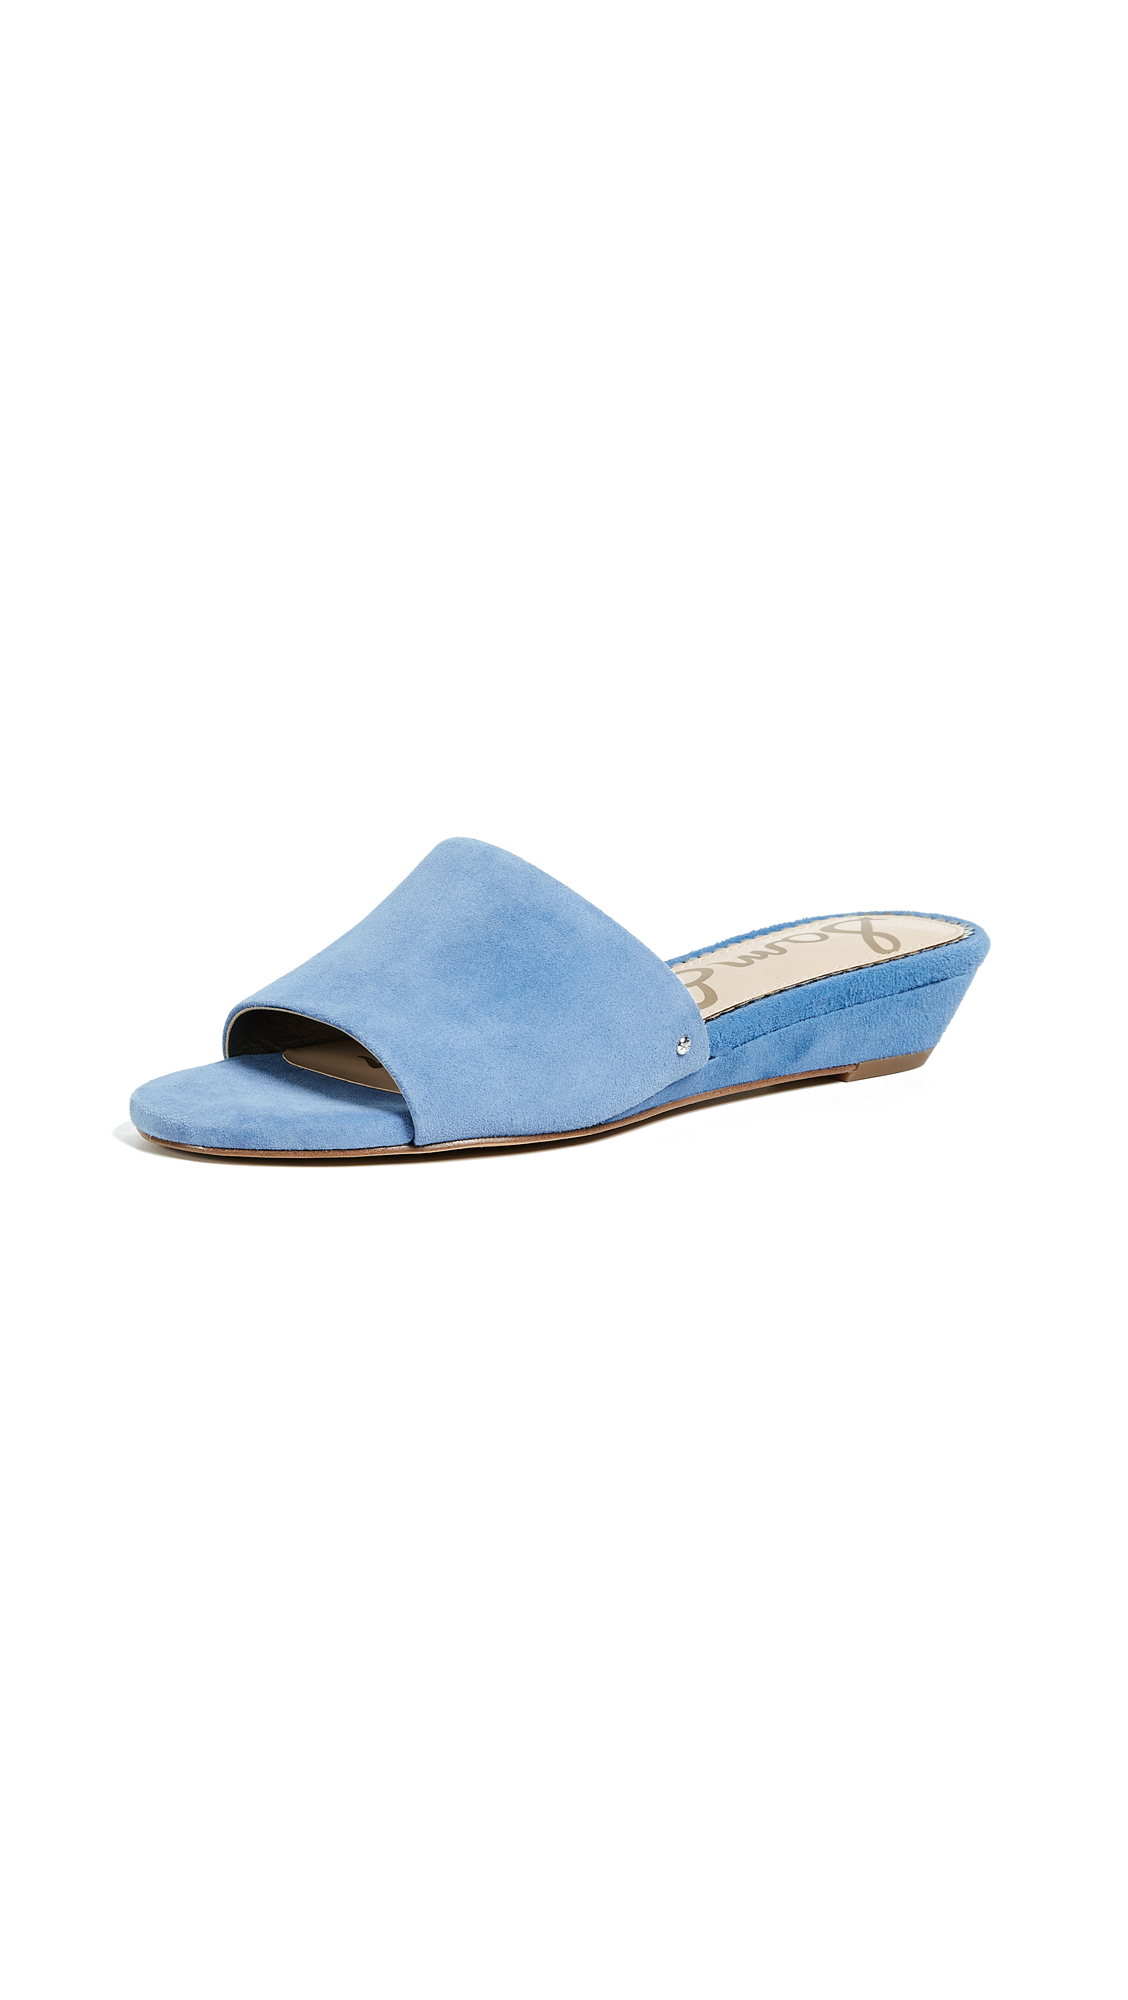 Sam Edelman Liliana Demi Wedge Slides - Denim Blue